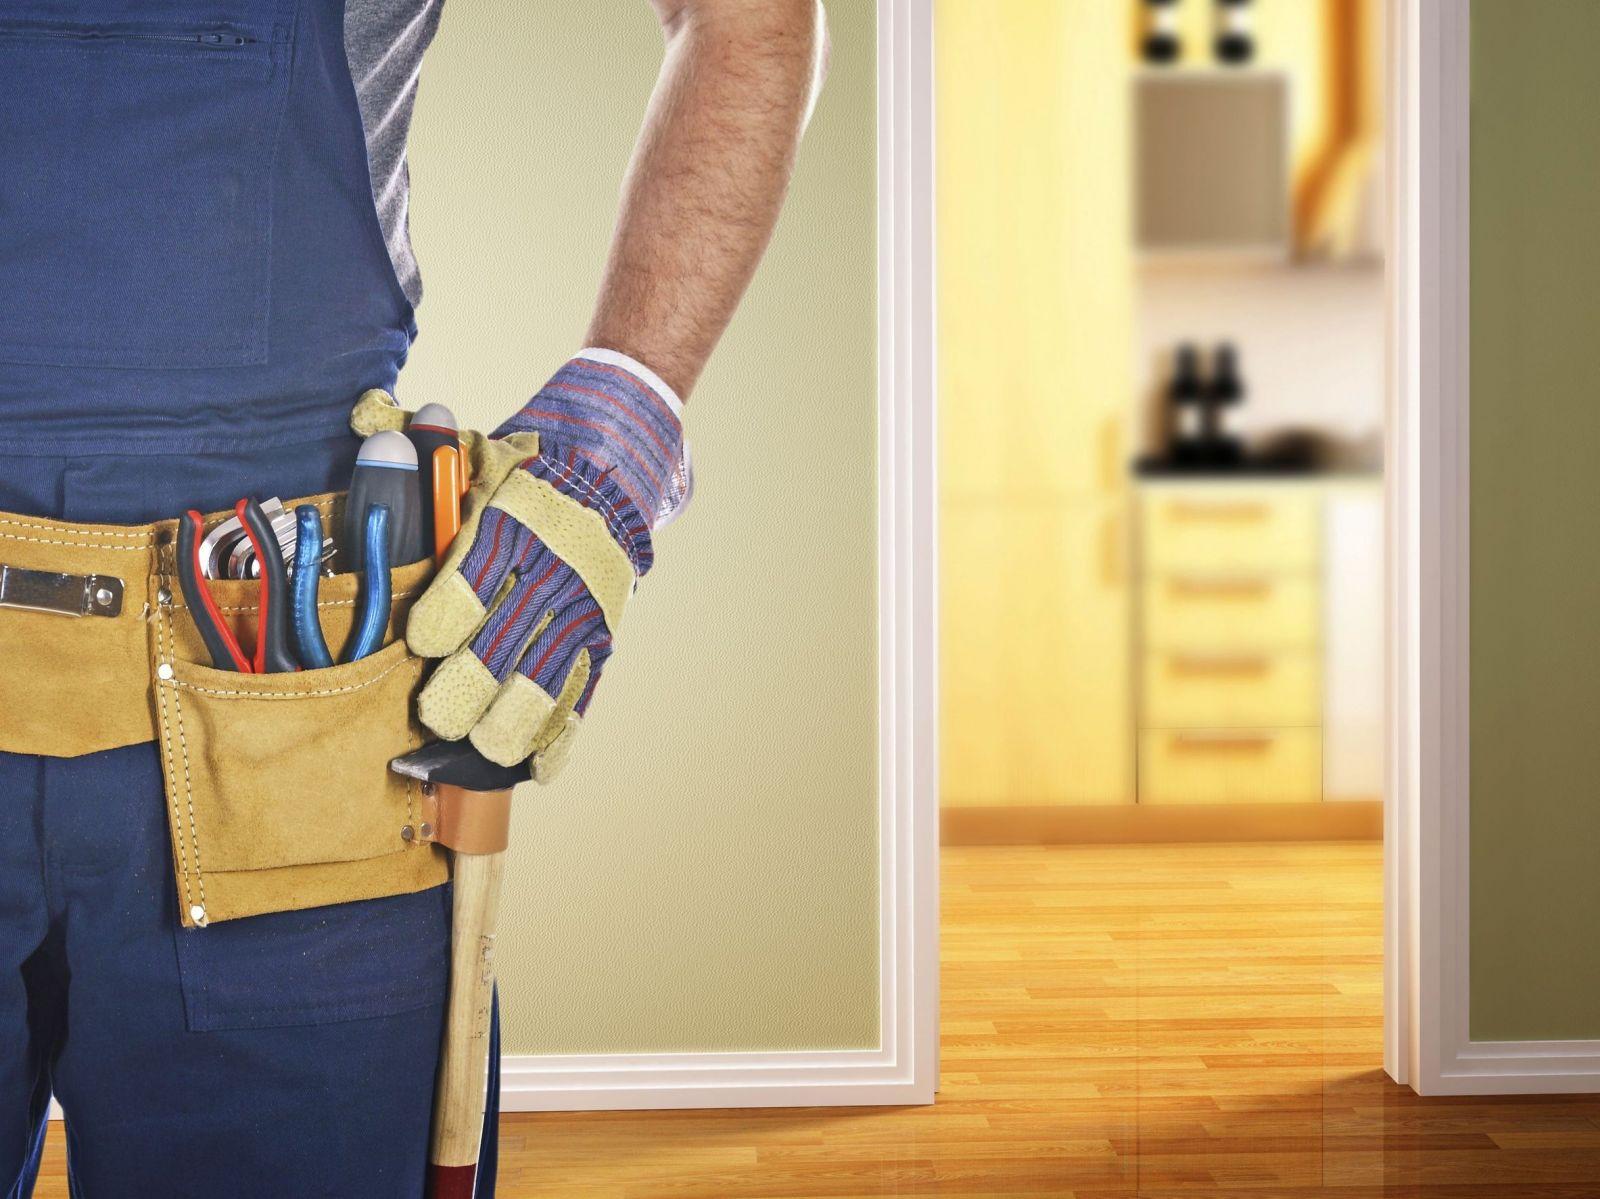 All repair services